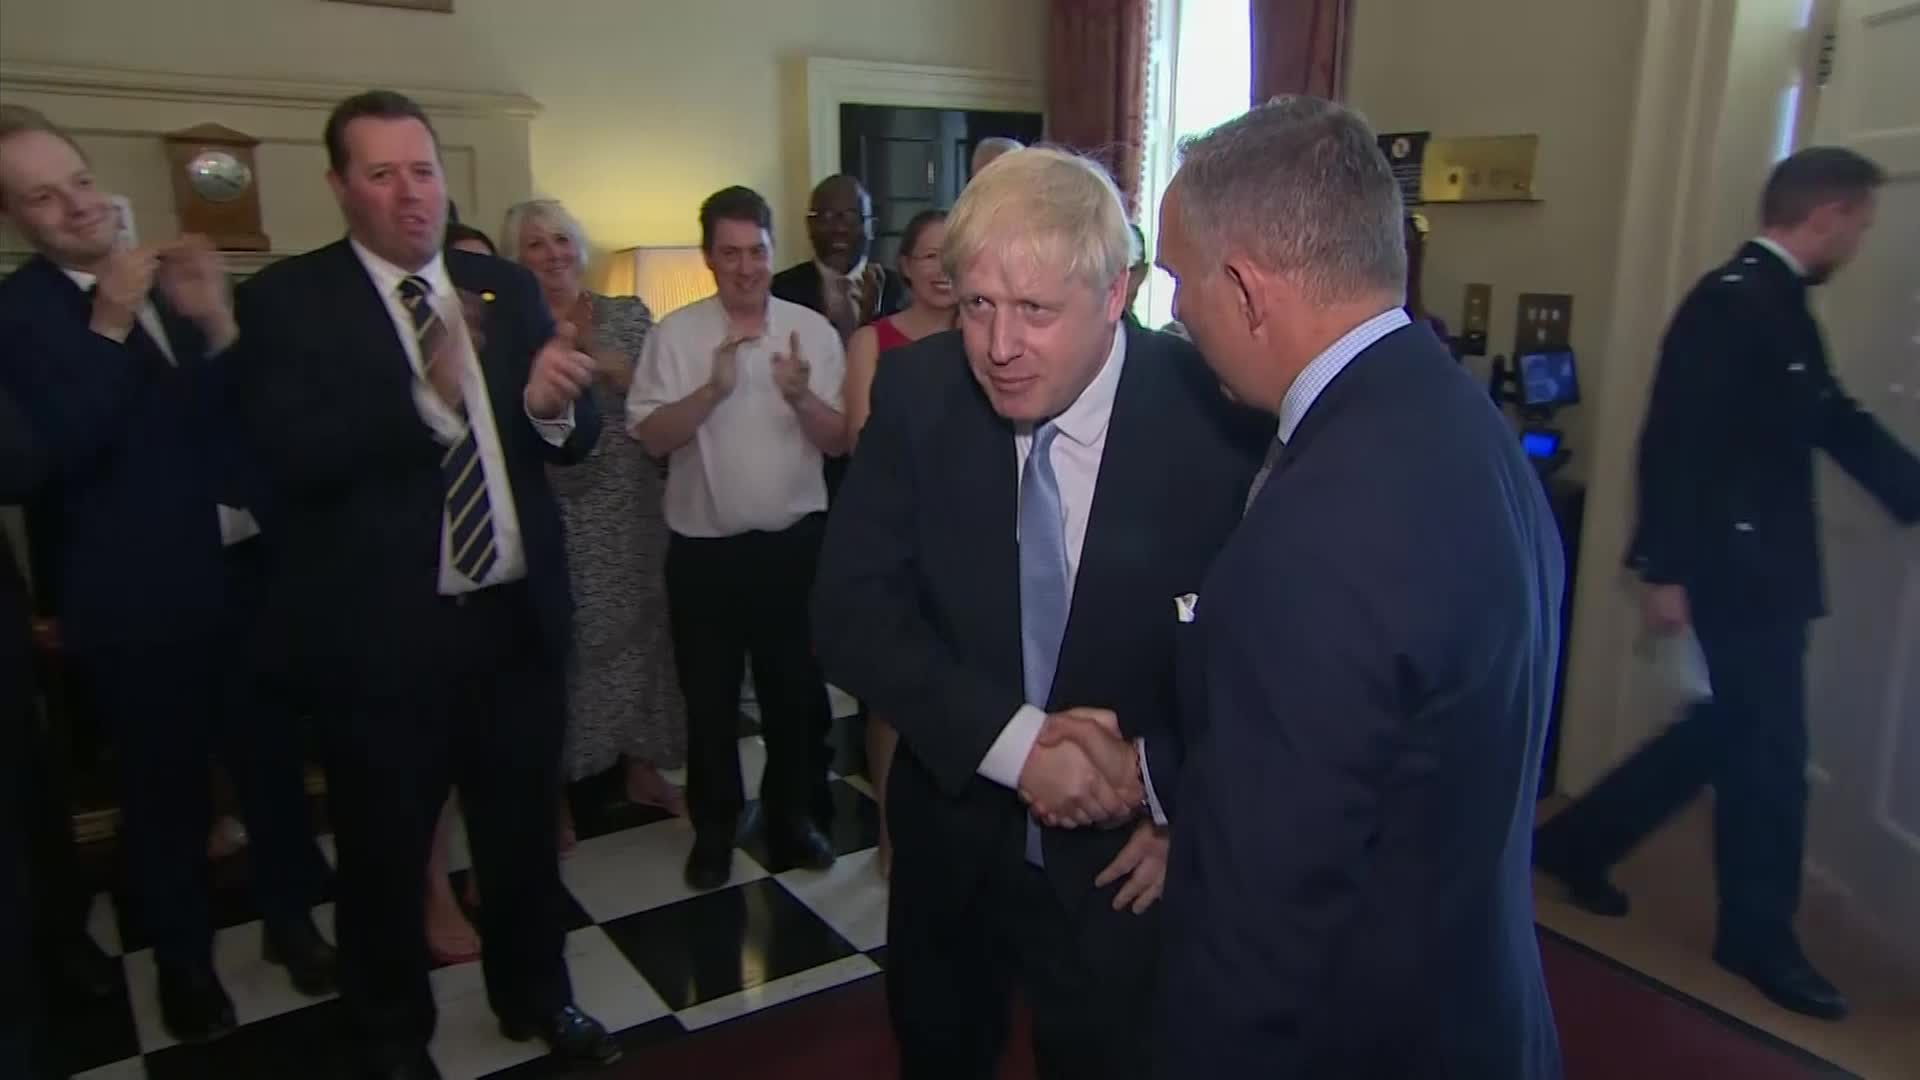 Angela Rayner Asks Boris Johnson To 'Stop Lying To Us' And Sign Honesty Pledge